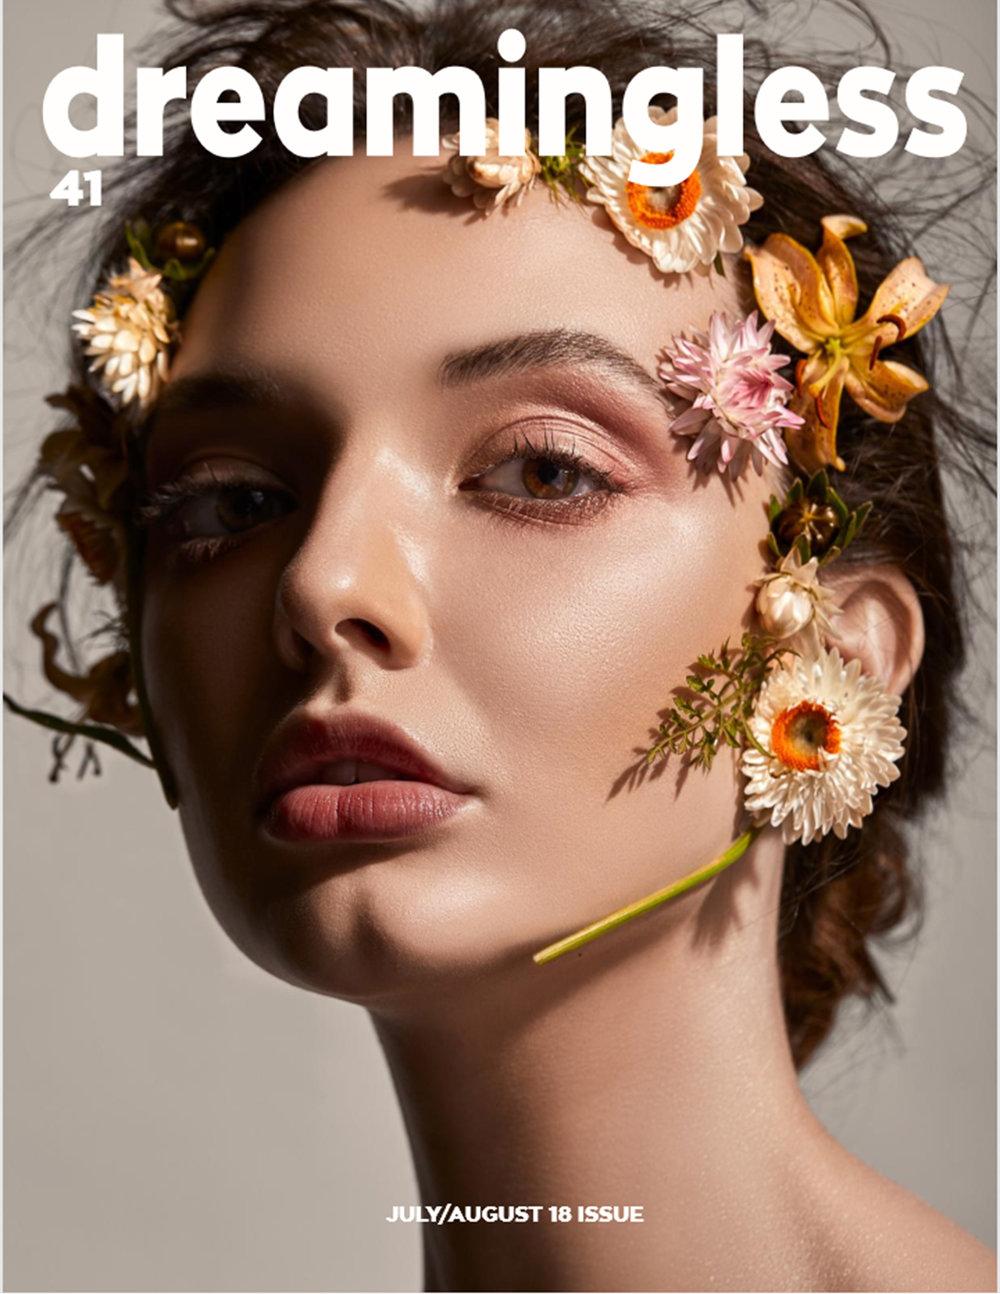 A Flower Girl - Front Cover and Editorial for Dreamingless Magazine Vol. 41Photographer & Retouching: Luis Martinez (IG: @luis_martinez93)HMUA: Rocio Vielma (IG: @vivemakeup)Styling & Creative Direction: Patricio Rivera (IG: @twelvethirtyfourflowers)Model: Alexandria Bryant (IG: @alexeatsplants) from The Kim Dawson Agency